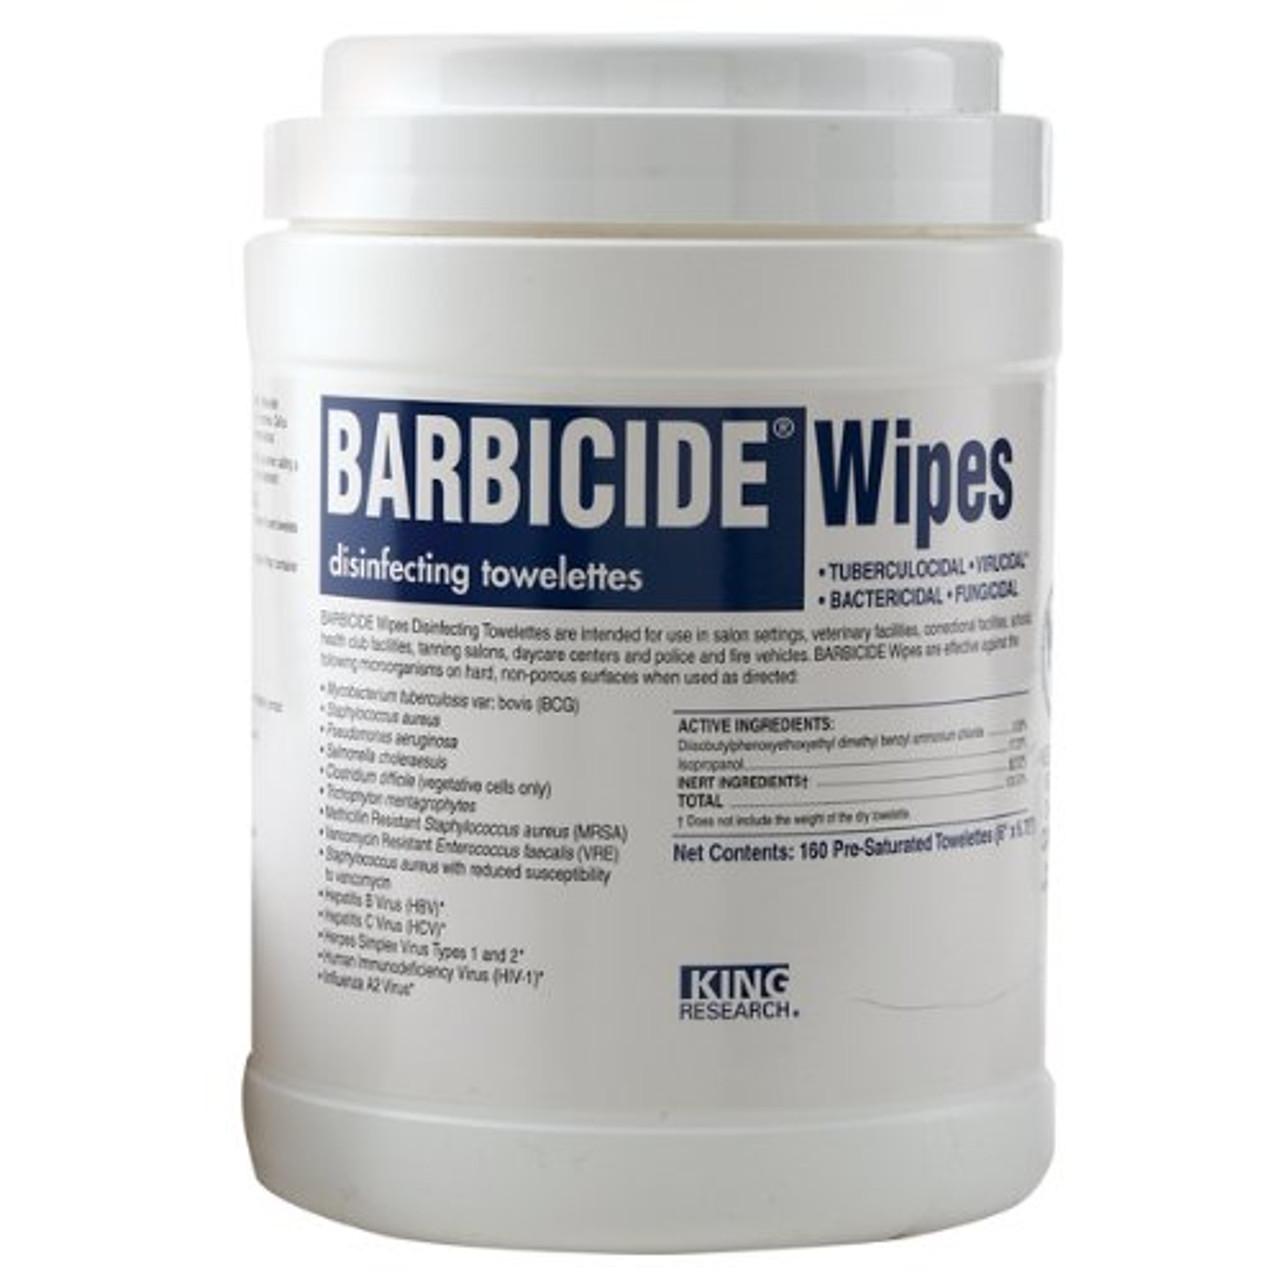 Barbicide Wipes